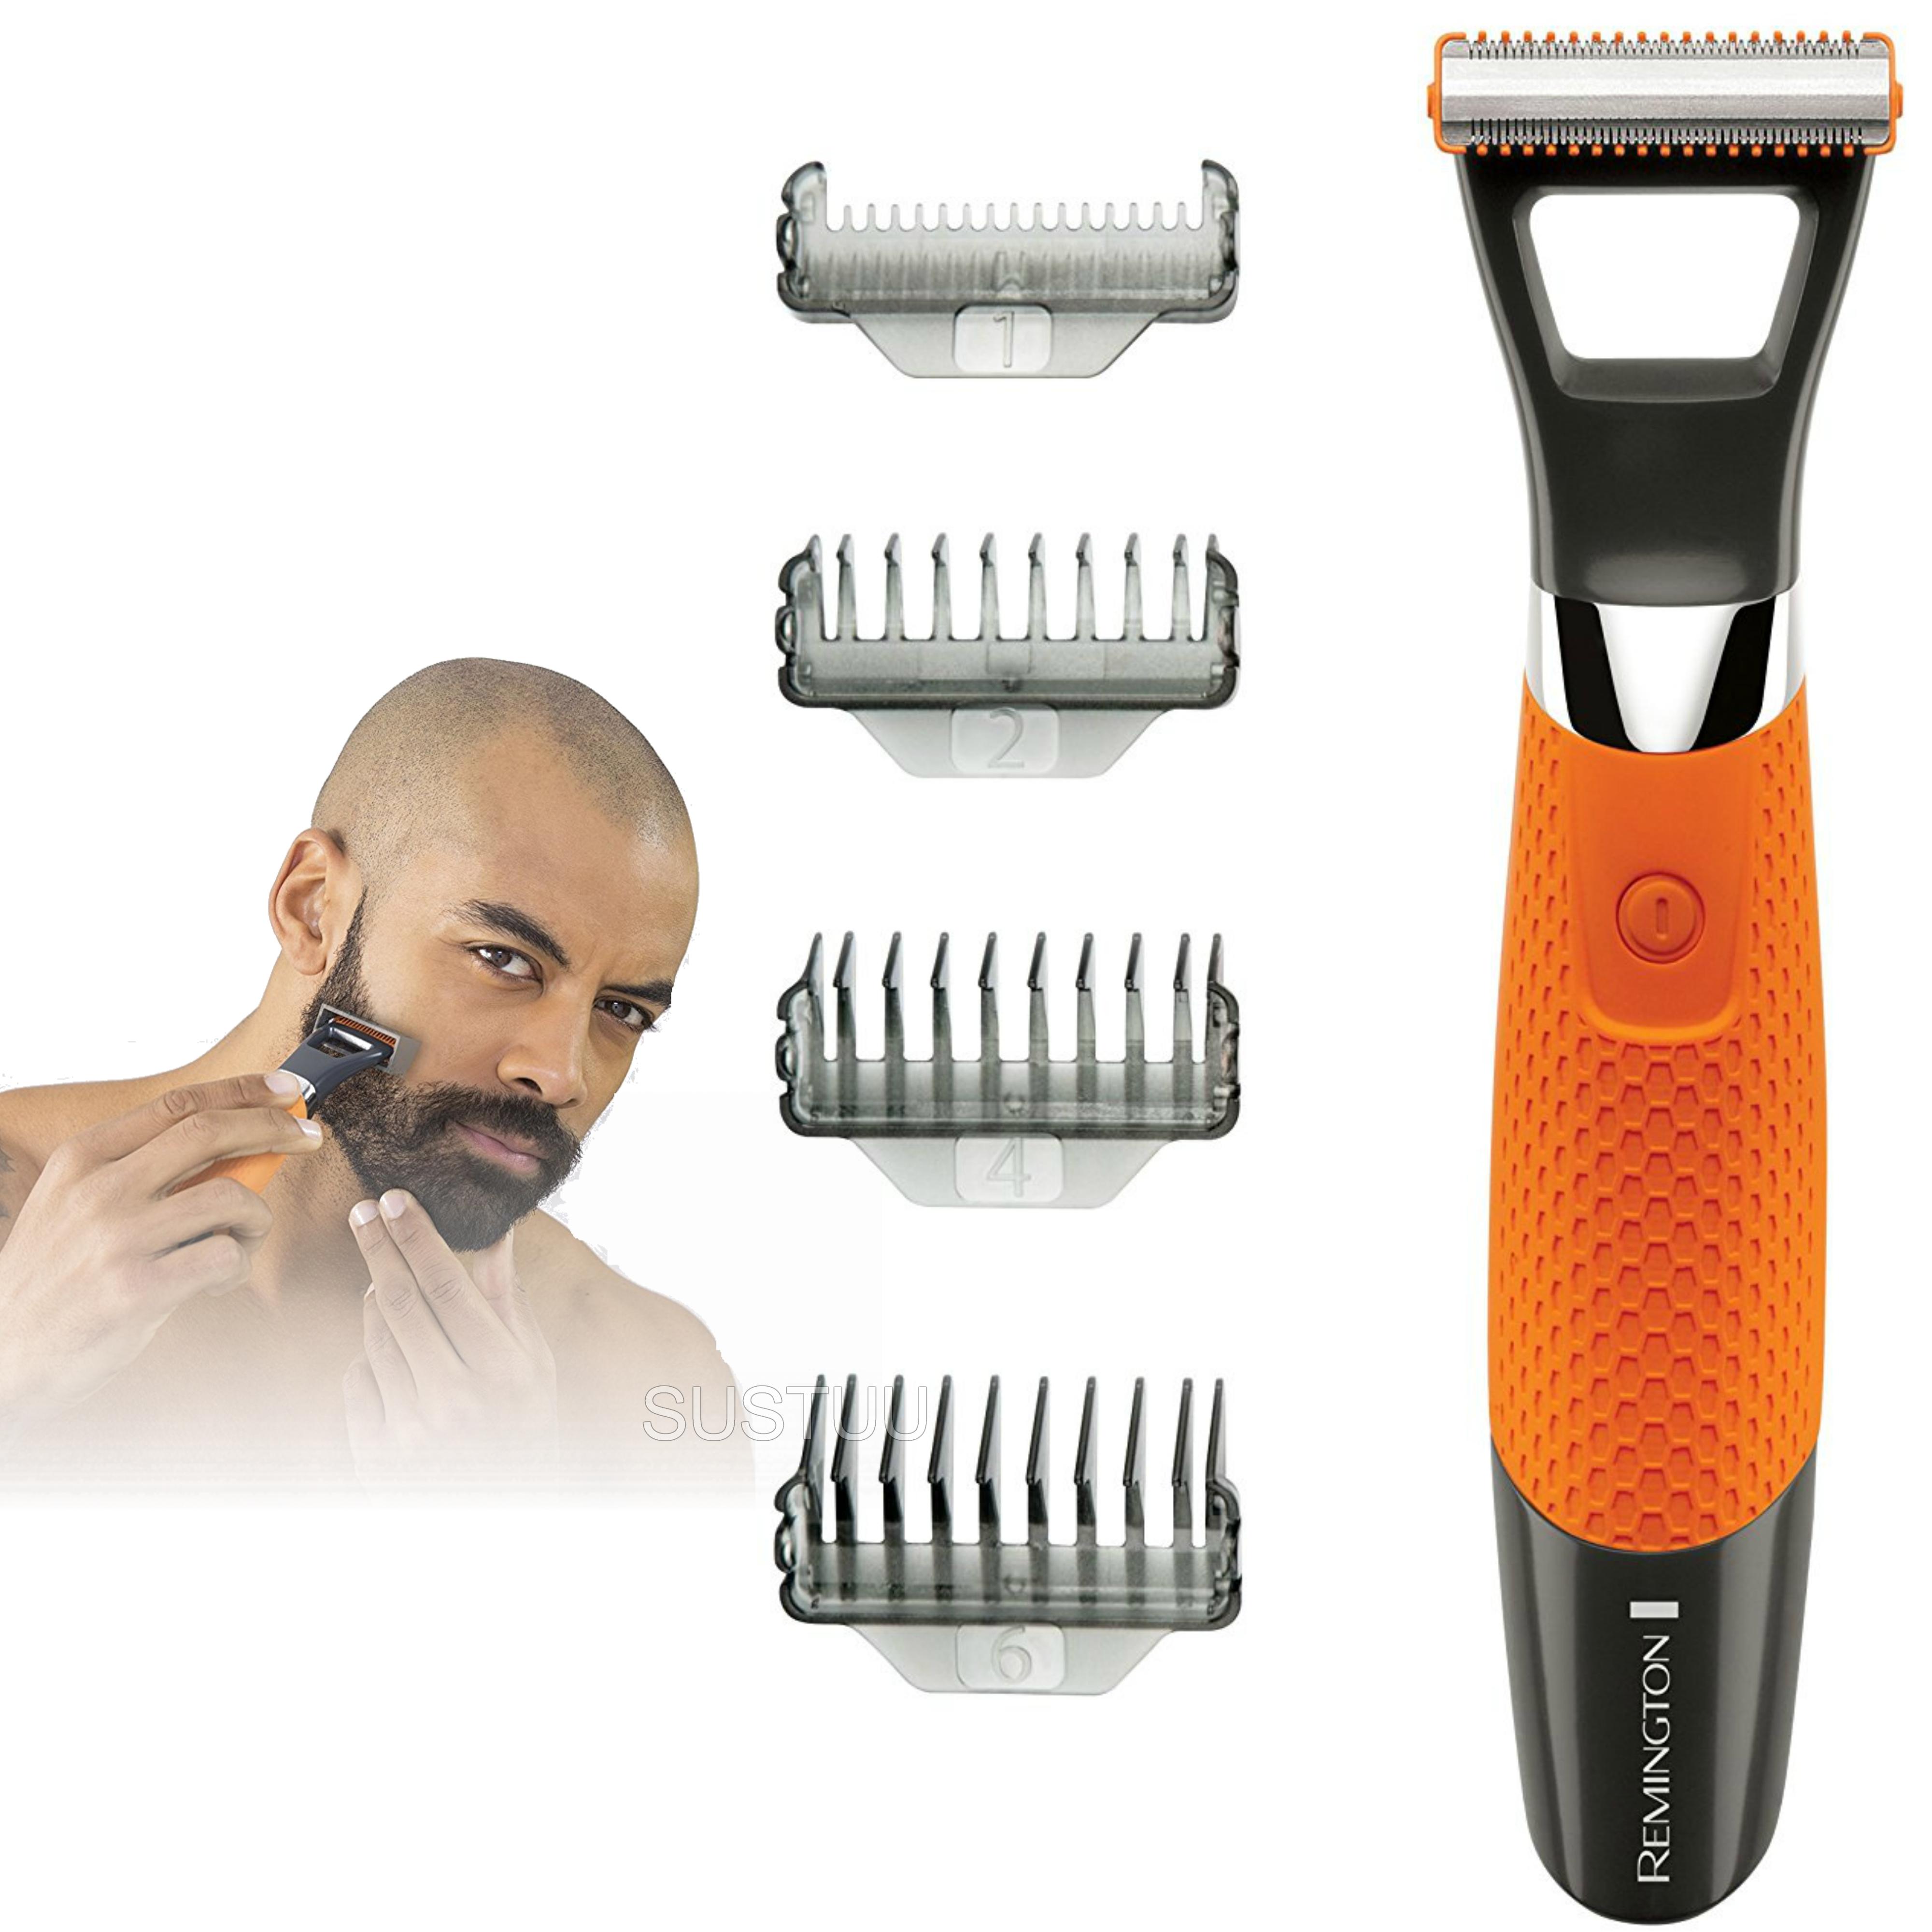 Remington Durablade Hybrid Lifetime Trimmer- Shaver | Hair Groomer | TST Ultra Blade